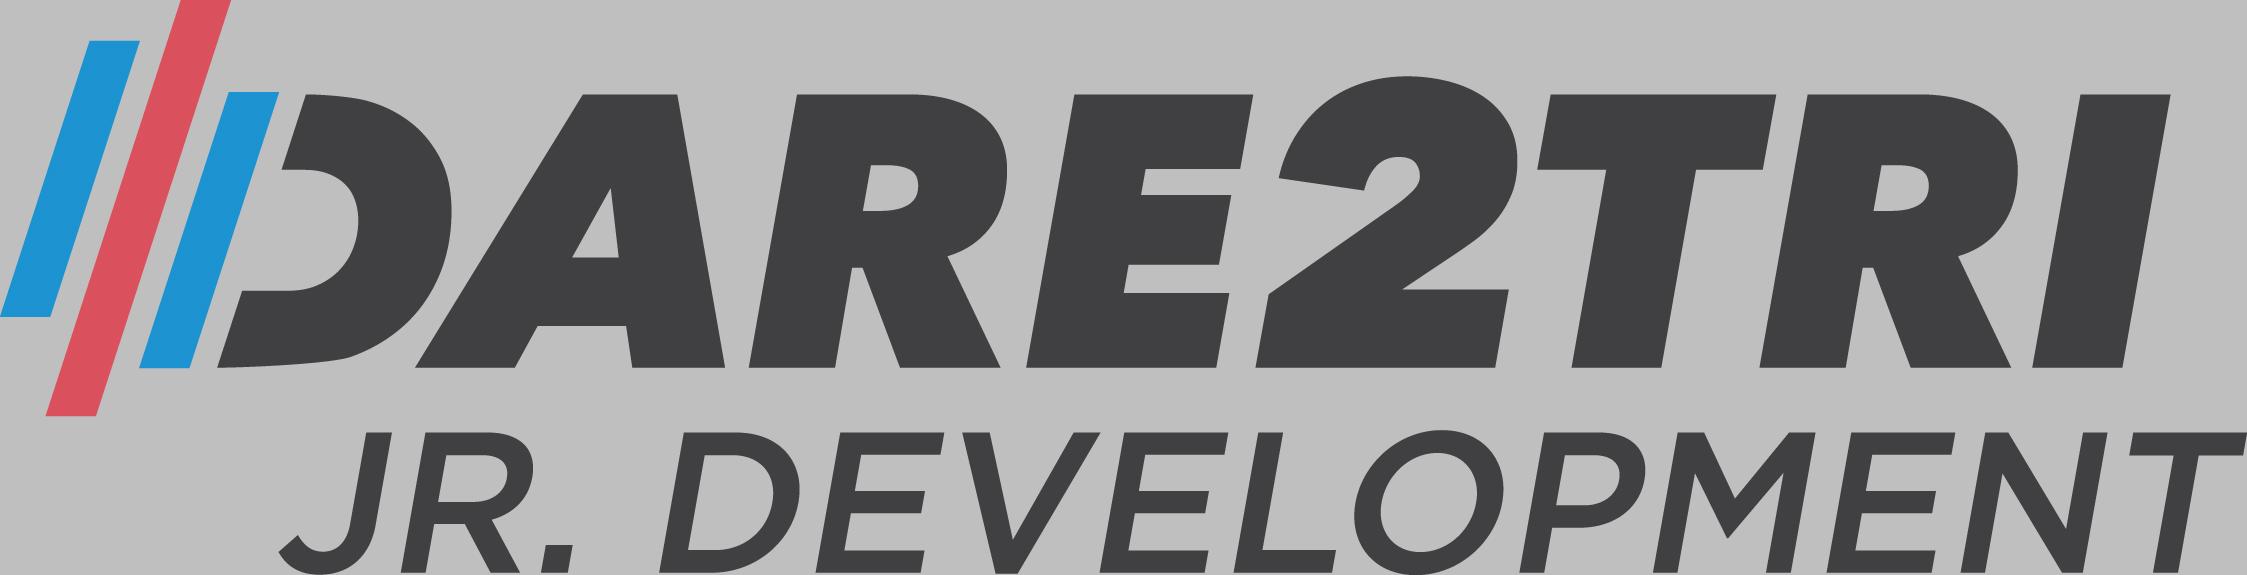 Junior-Development-Team-logo.jpg